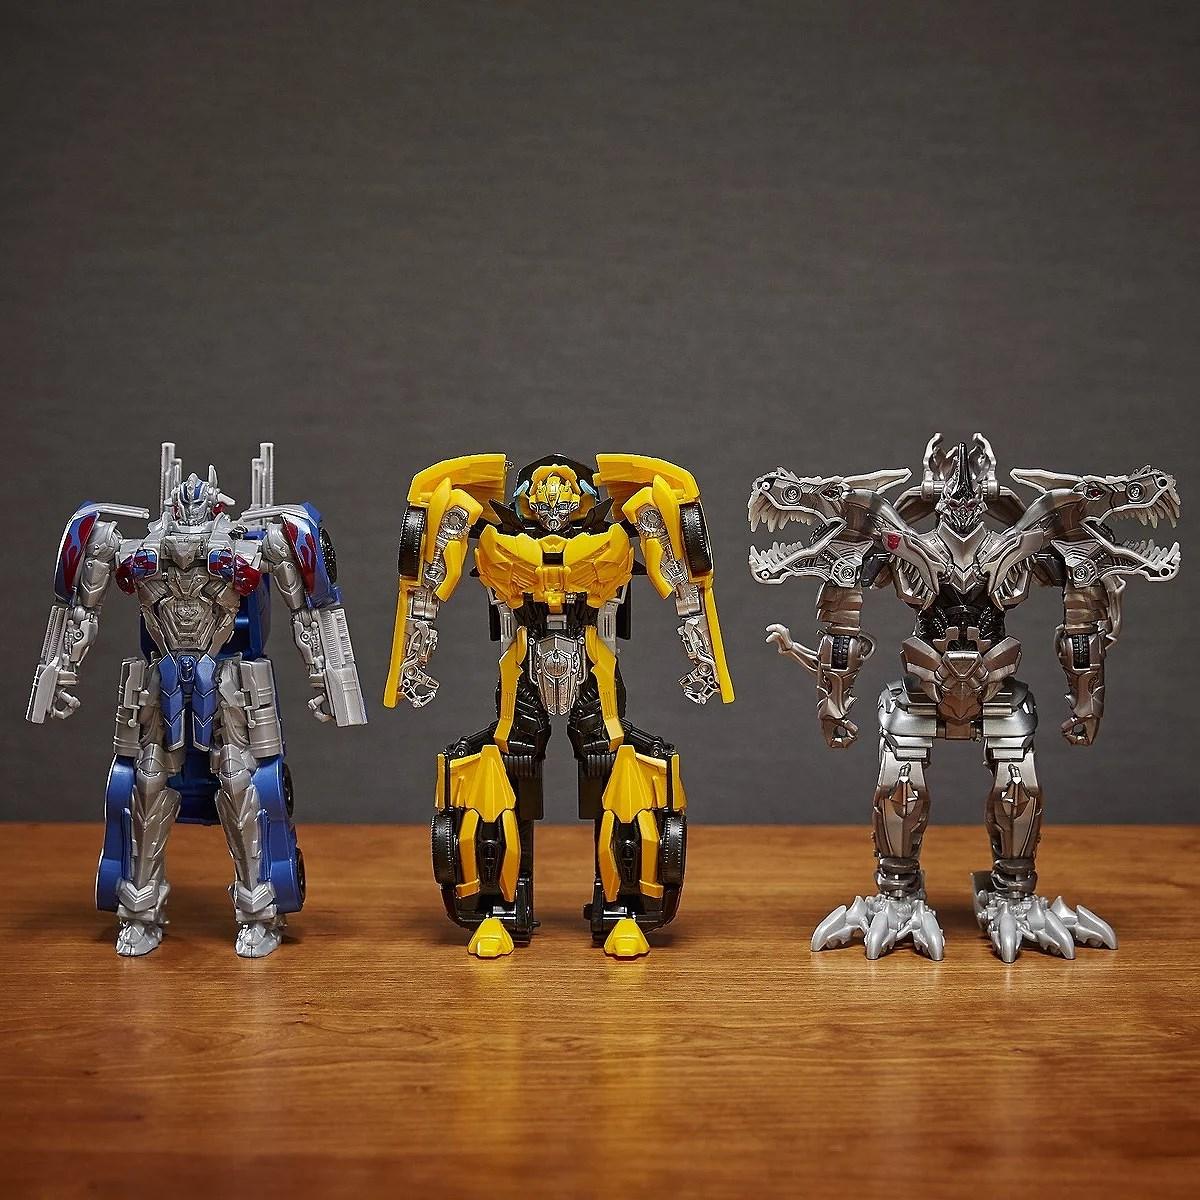 Transformers van Hasbro